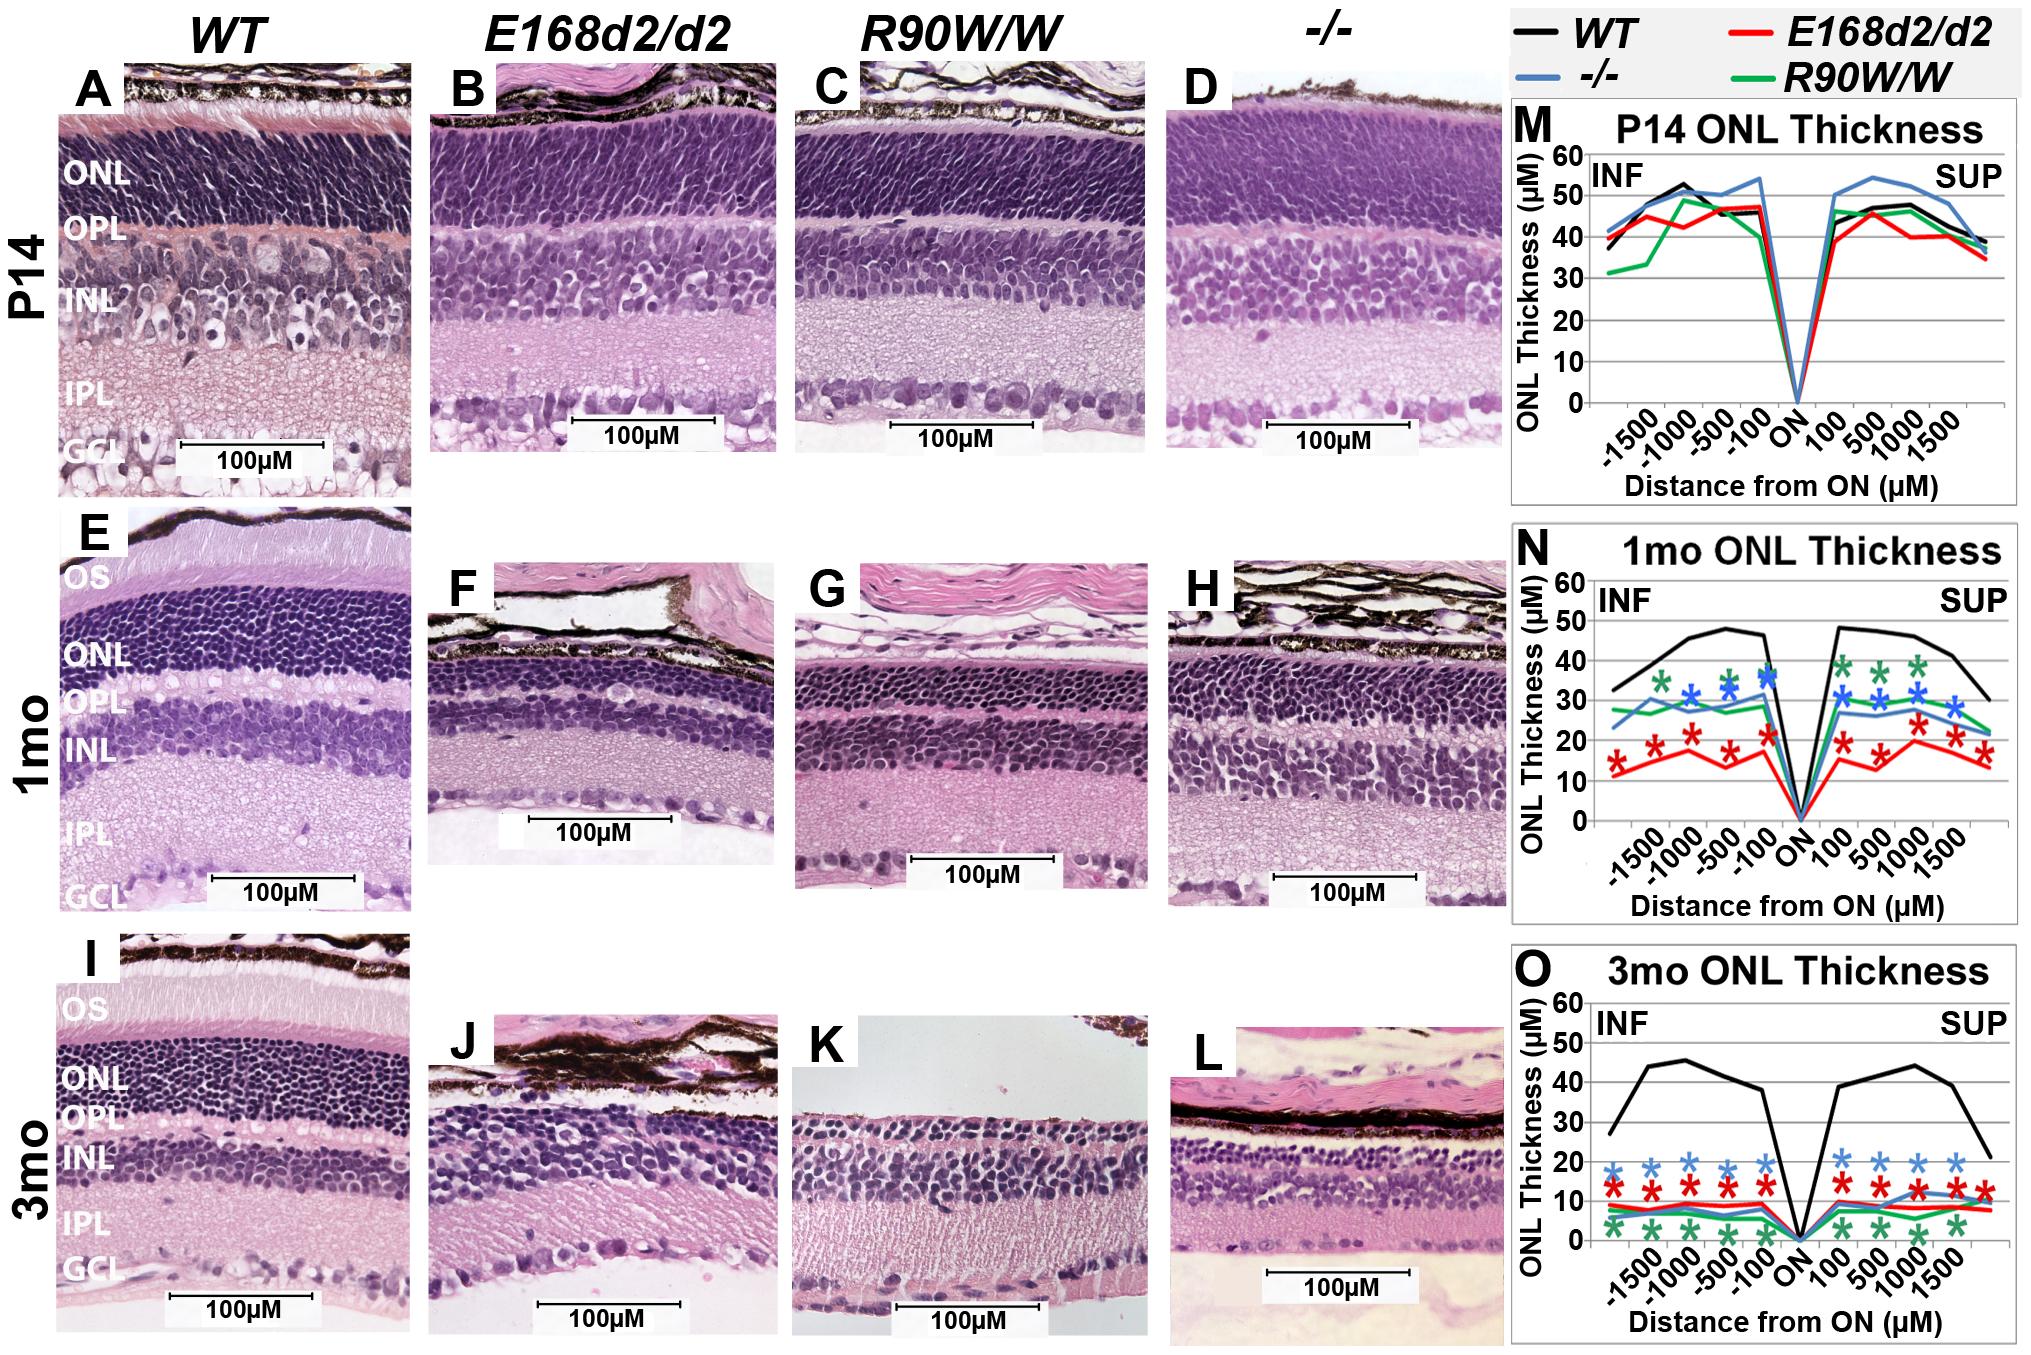 Homozygous <i>E168d2/d2</i> and <i>R90W/W</i> mice develop 'LCA'-like retinopathy.